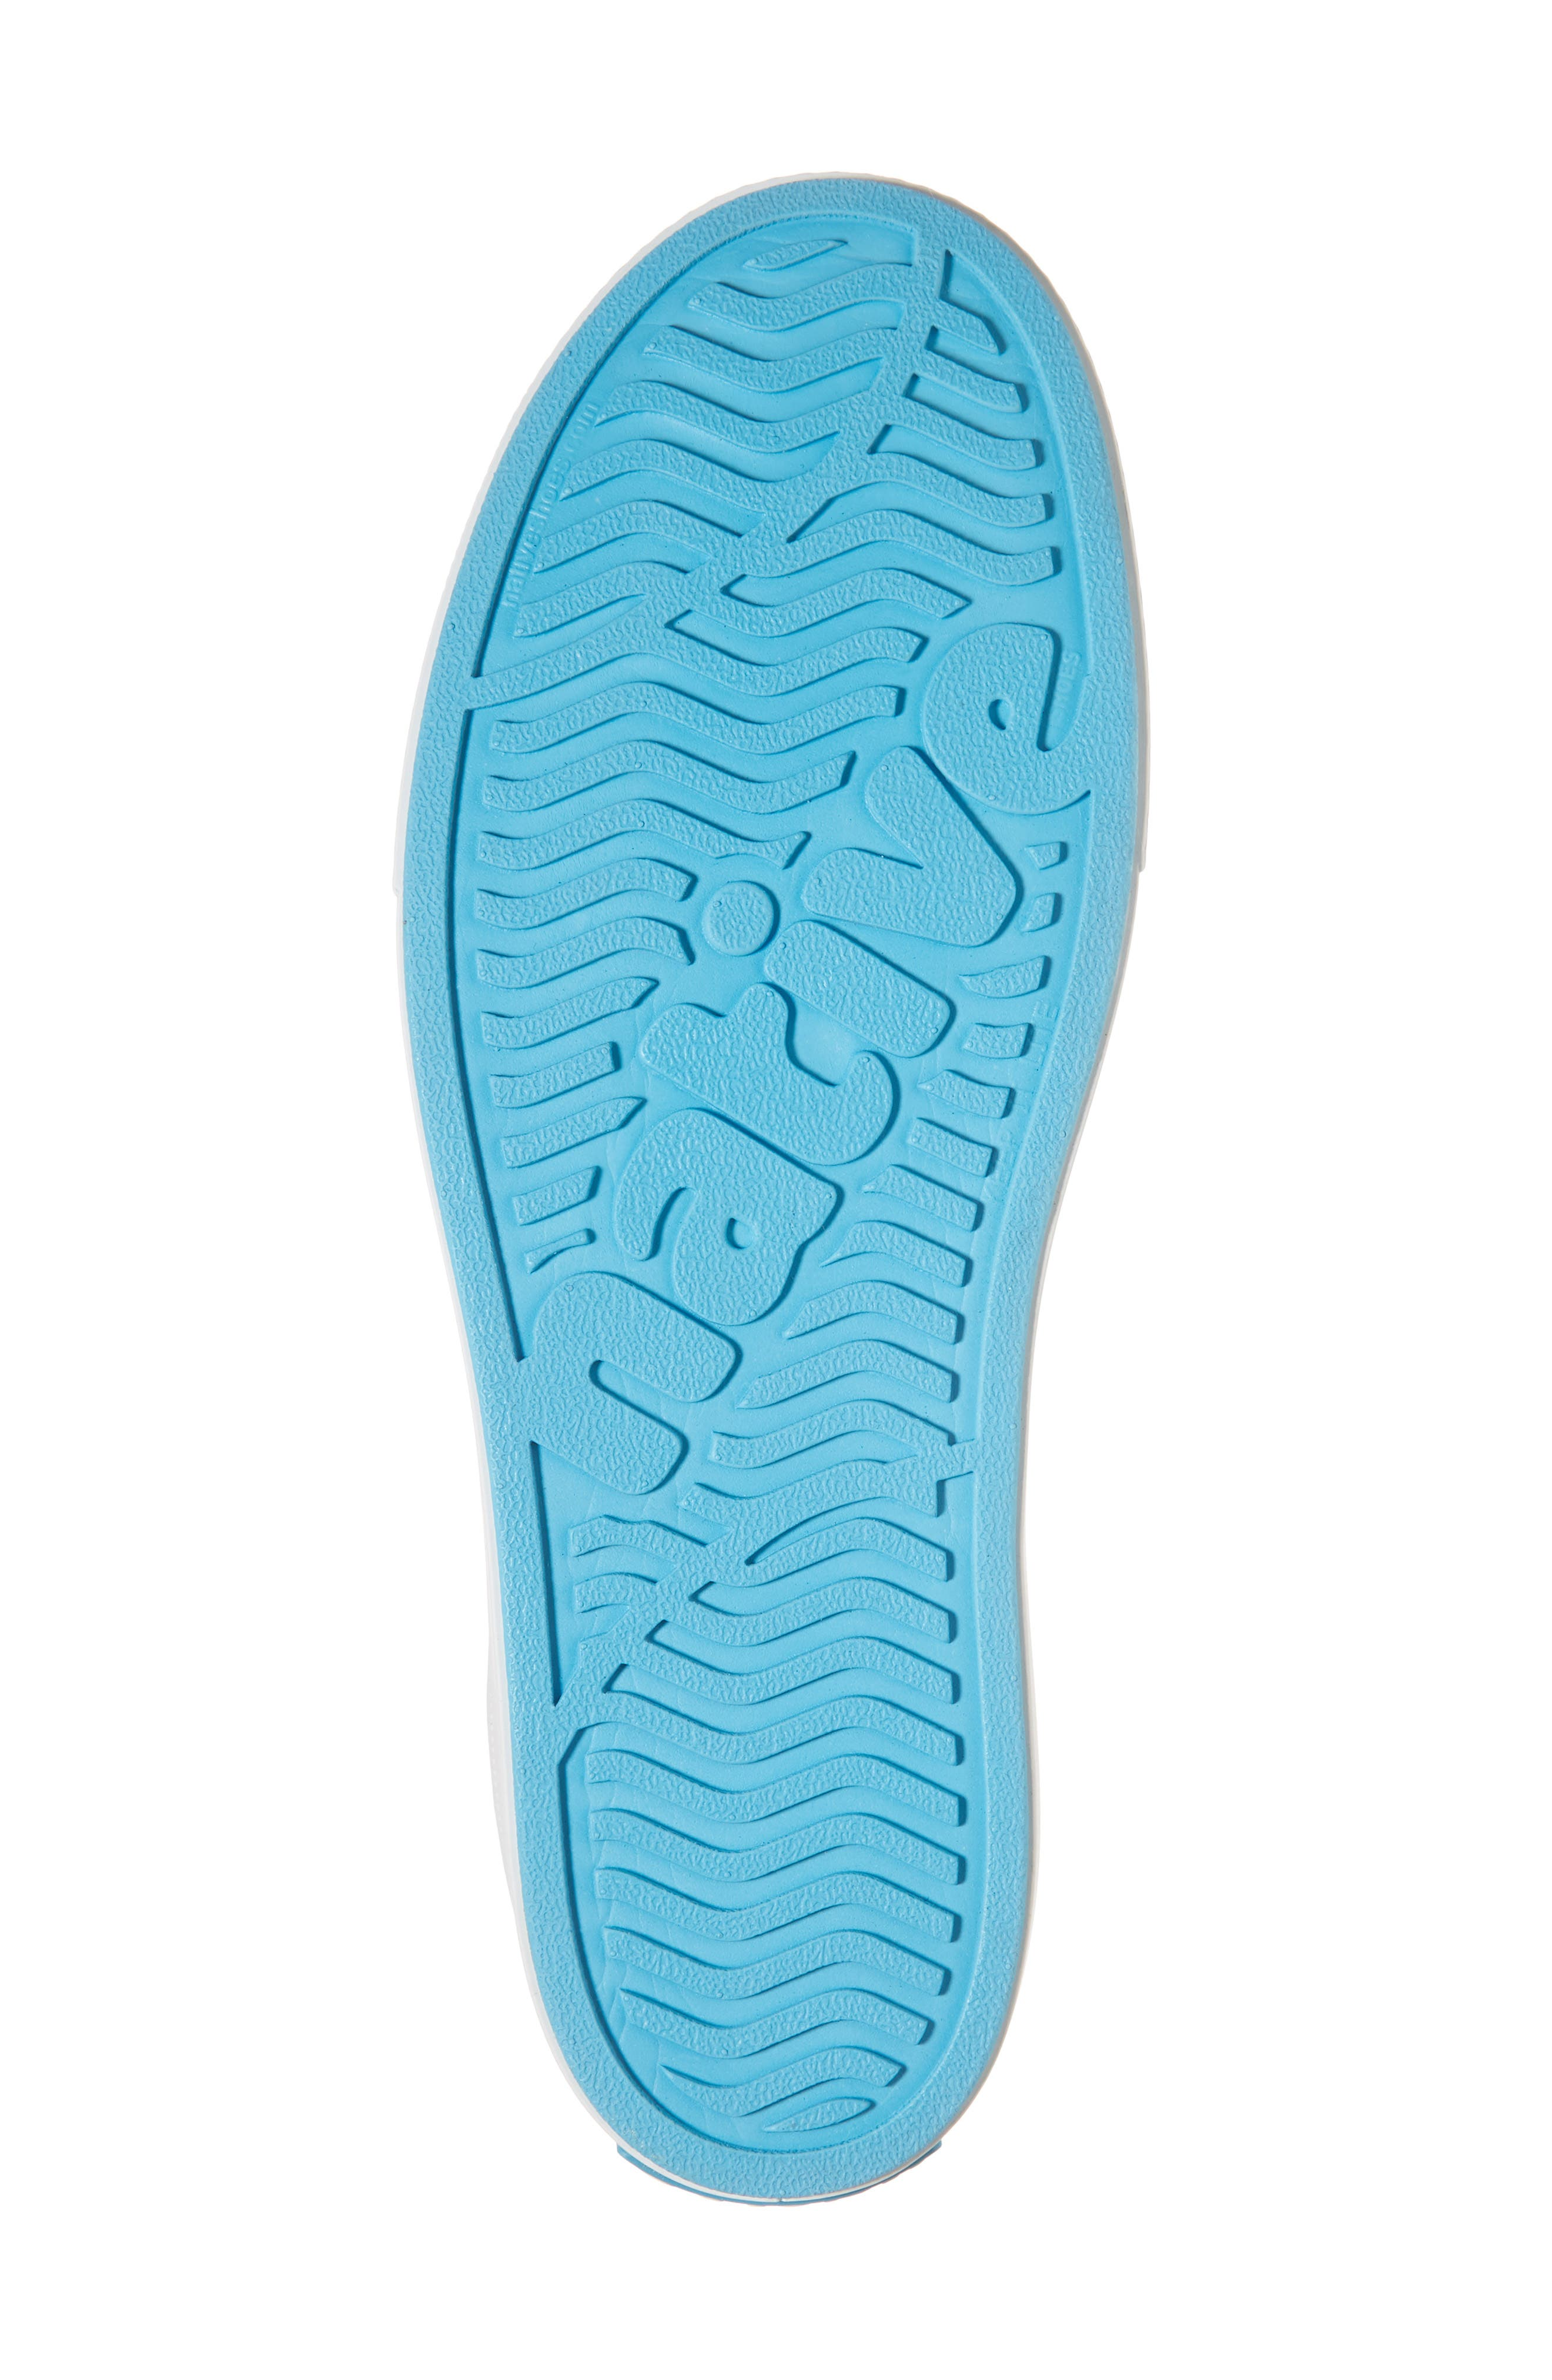 Miles Liteknit Slip-On Sneaker,                             Alternate thumbnail 6, color,                             JIFFY BLACK/ SHELL WHITE